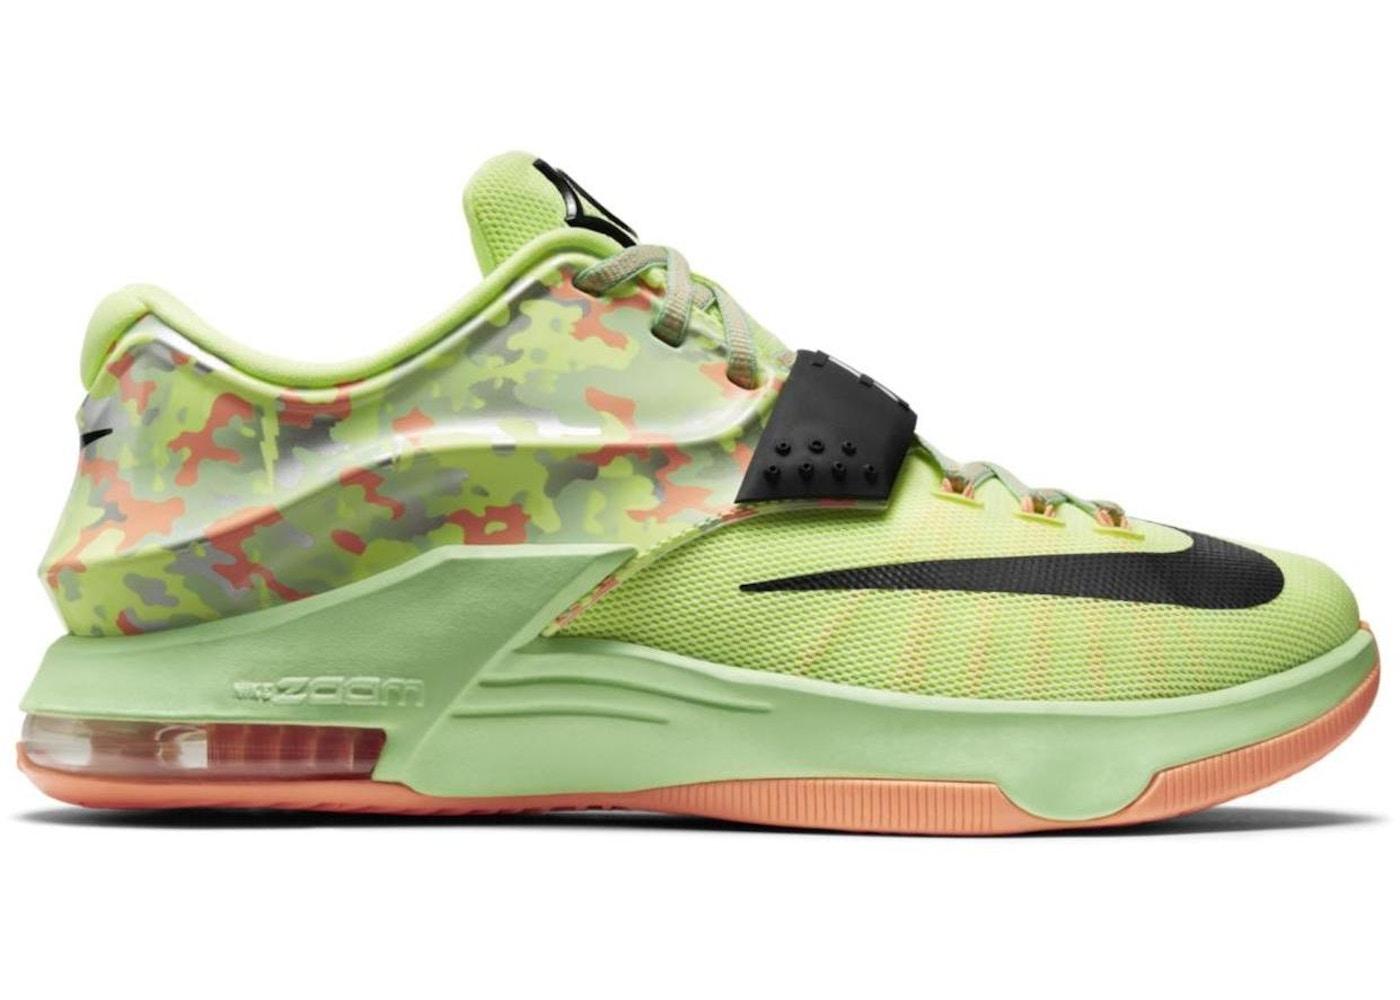 best value cdc37 a6b97 Buy Nike KD 7 Shoes & Deadstock Sneakers